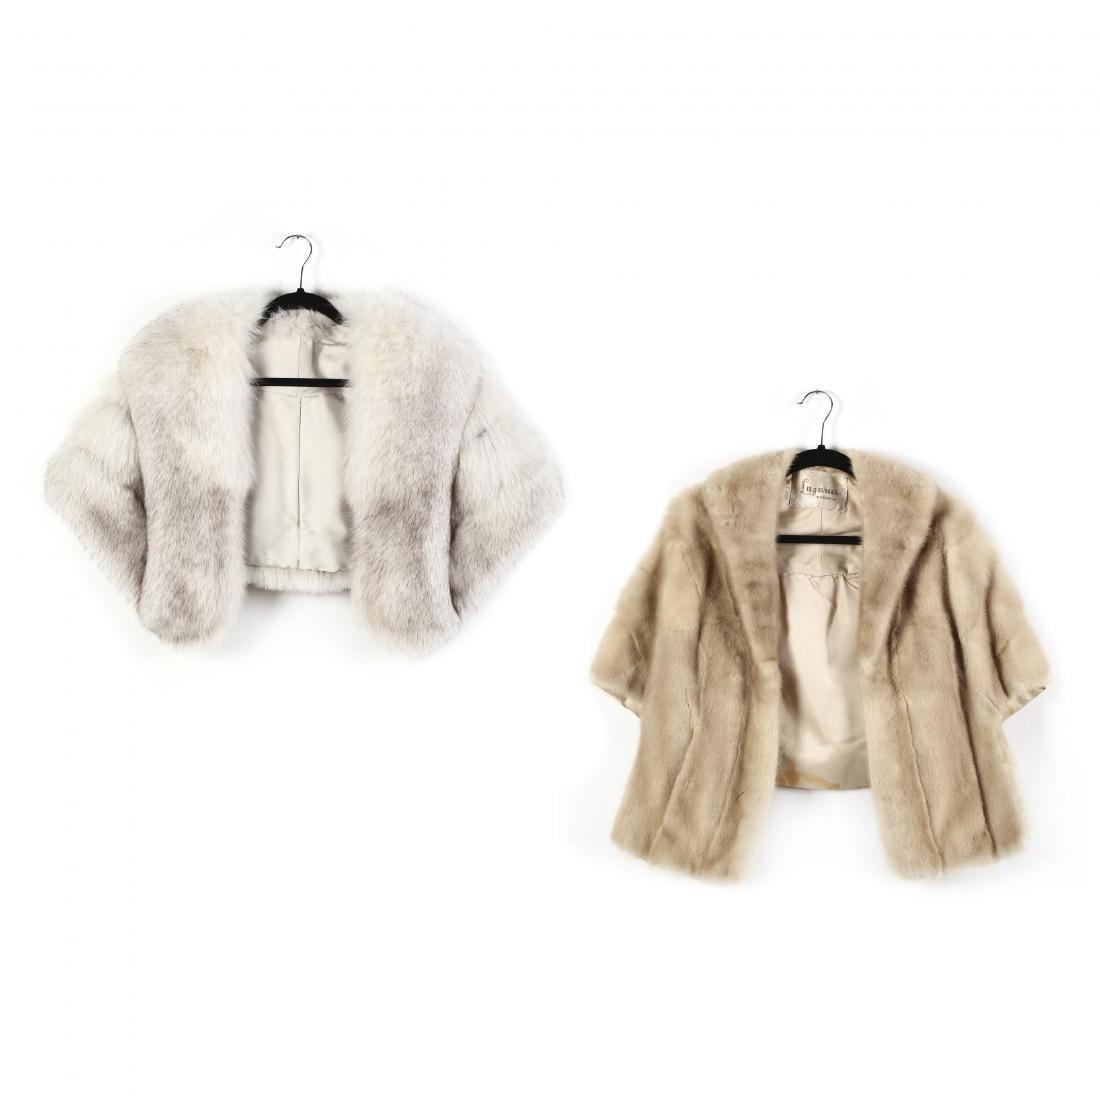 Two Fur Stoles